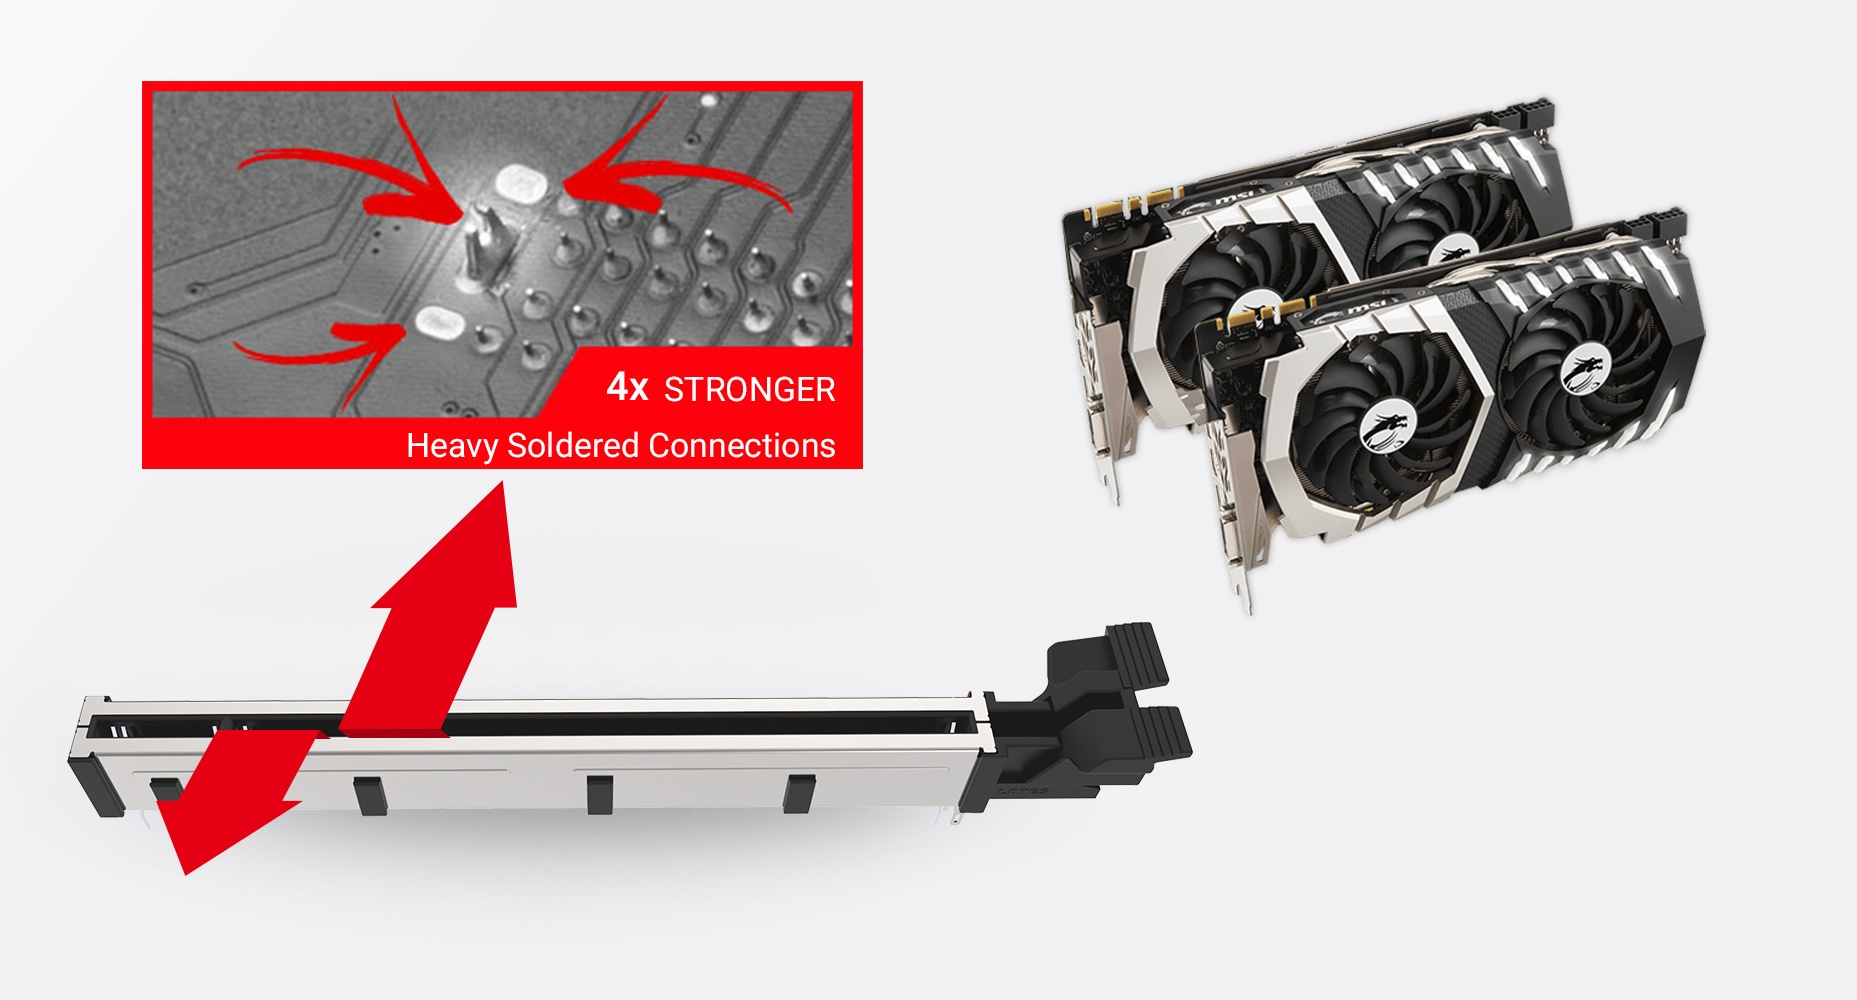 MSI MAG B460 TOMAHAWK MULTIPLE GPU SUPPORTS AND STEEL ARMOR